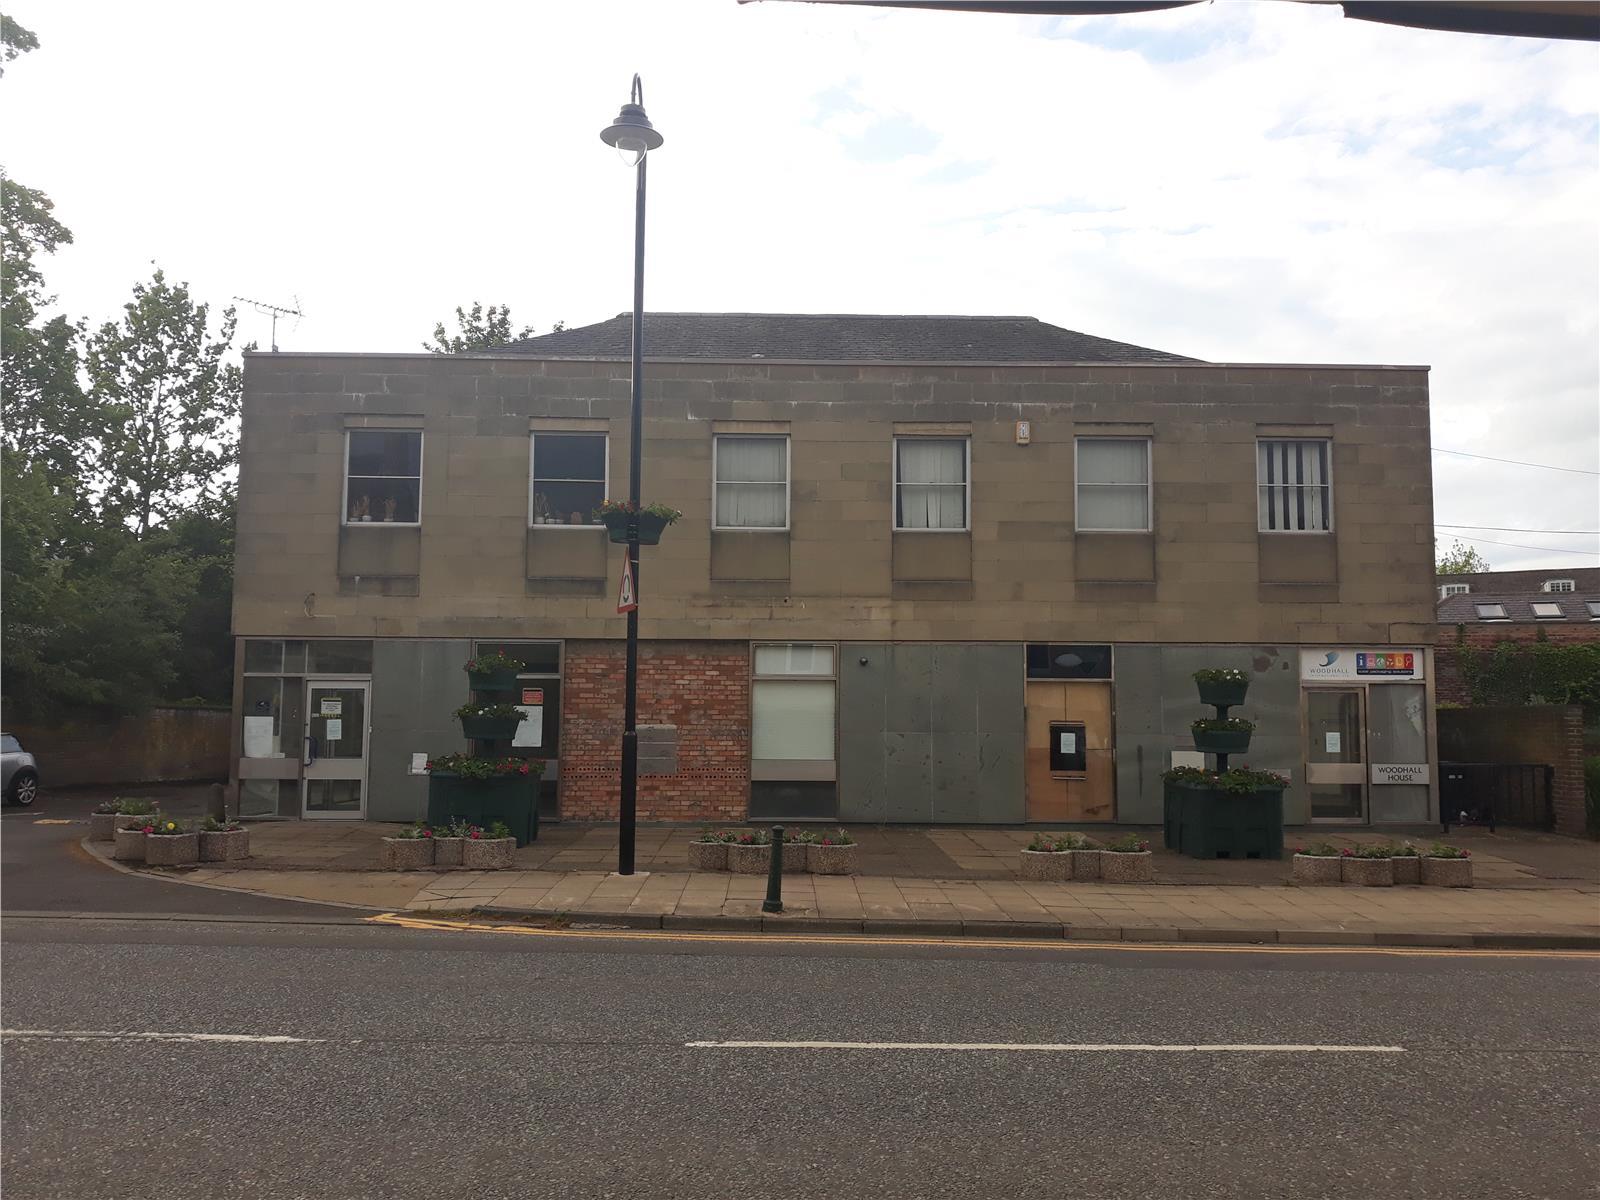 4-6 Main Street, Ponteland, Newcastle Upon Tyne, Northumberland, NE20 9NH